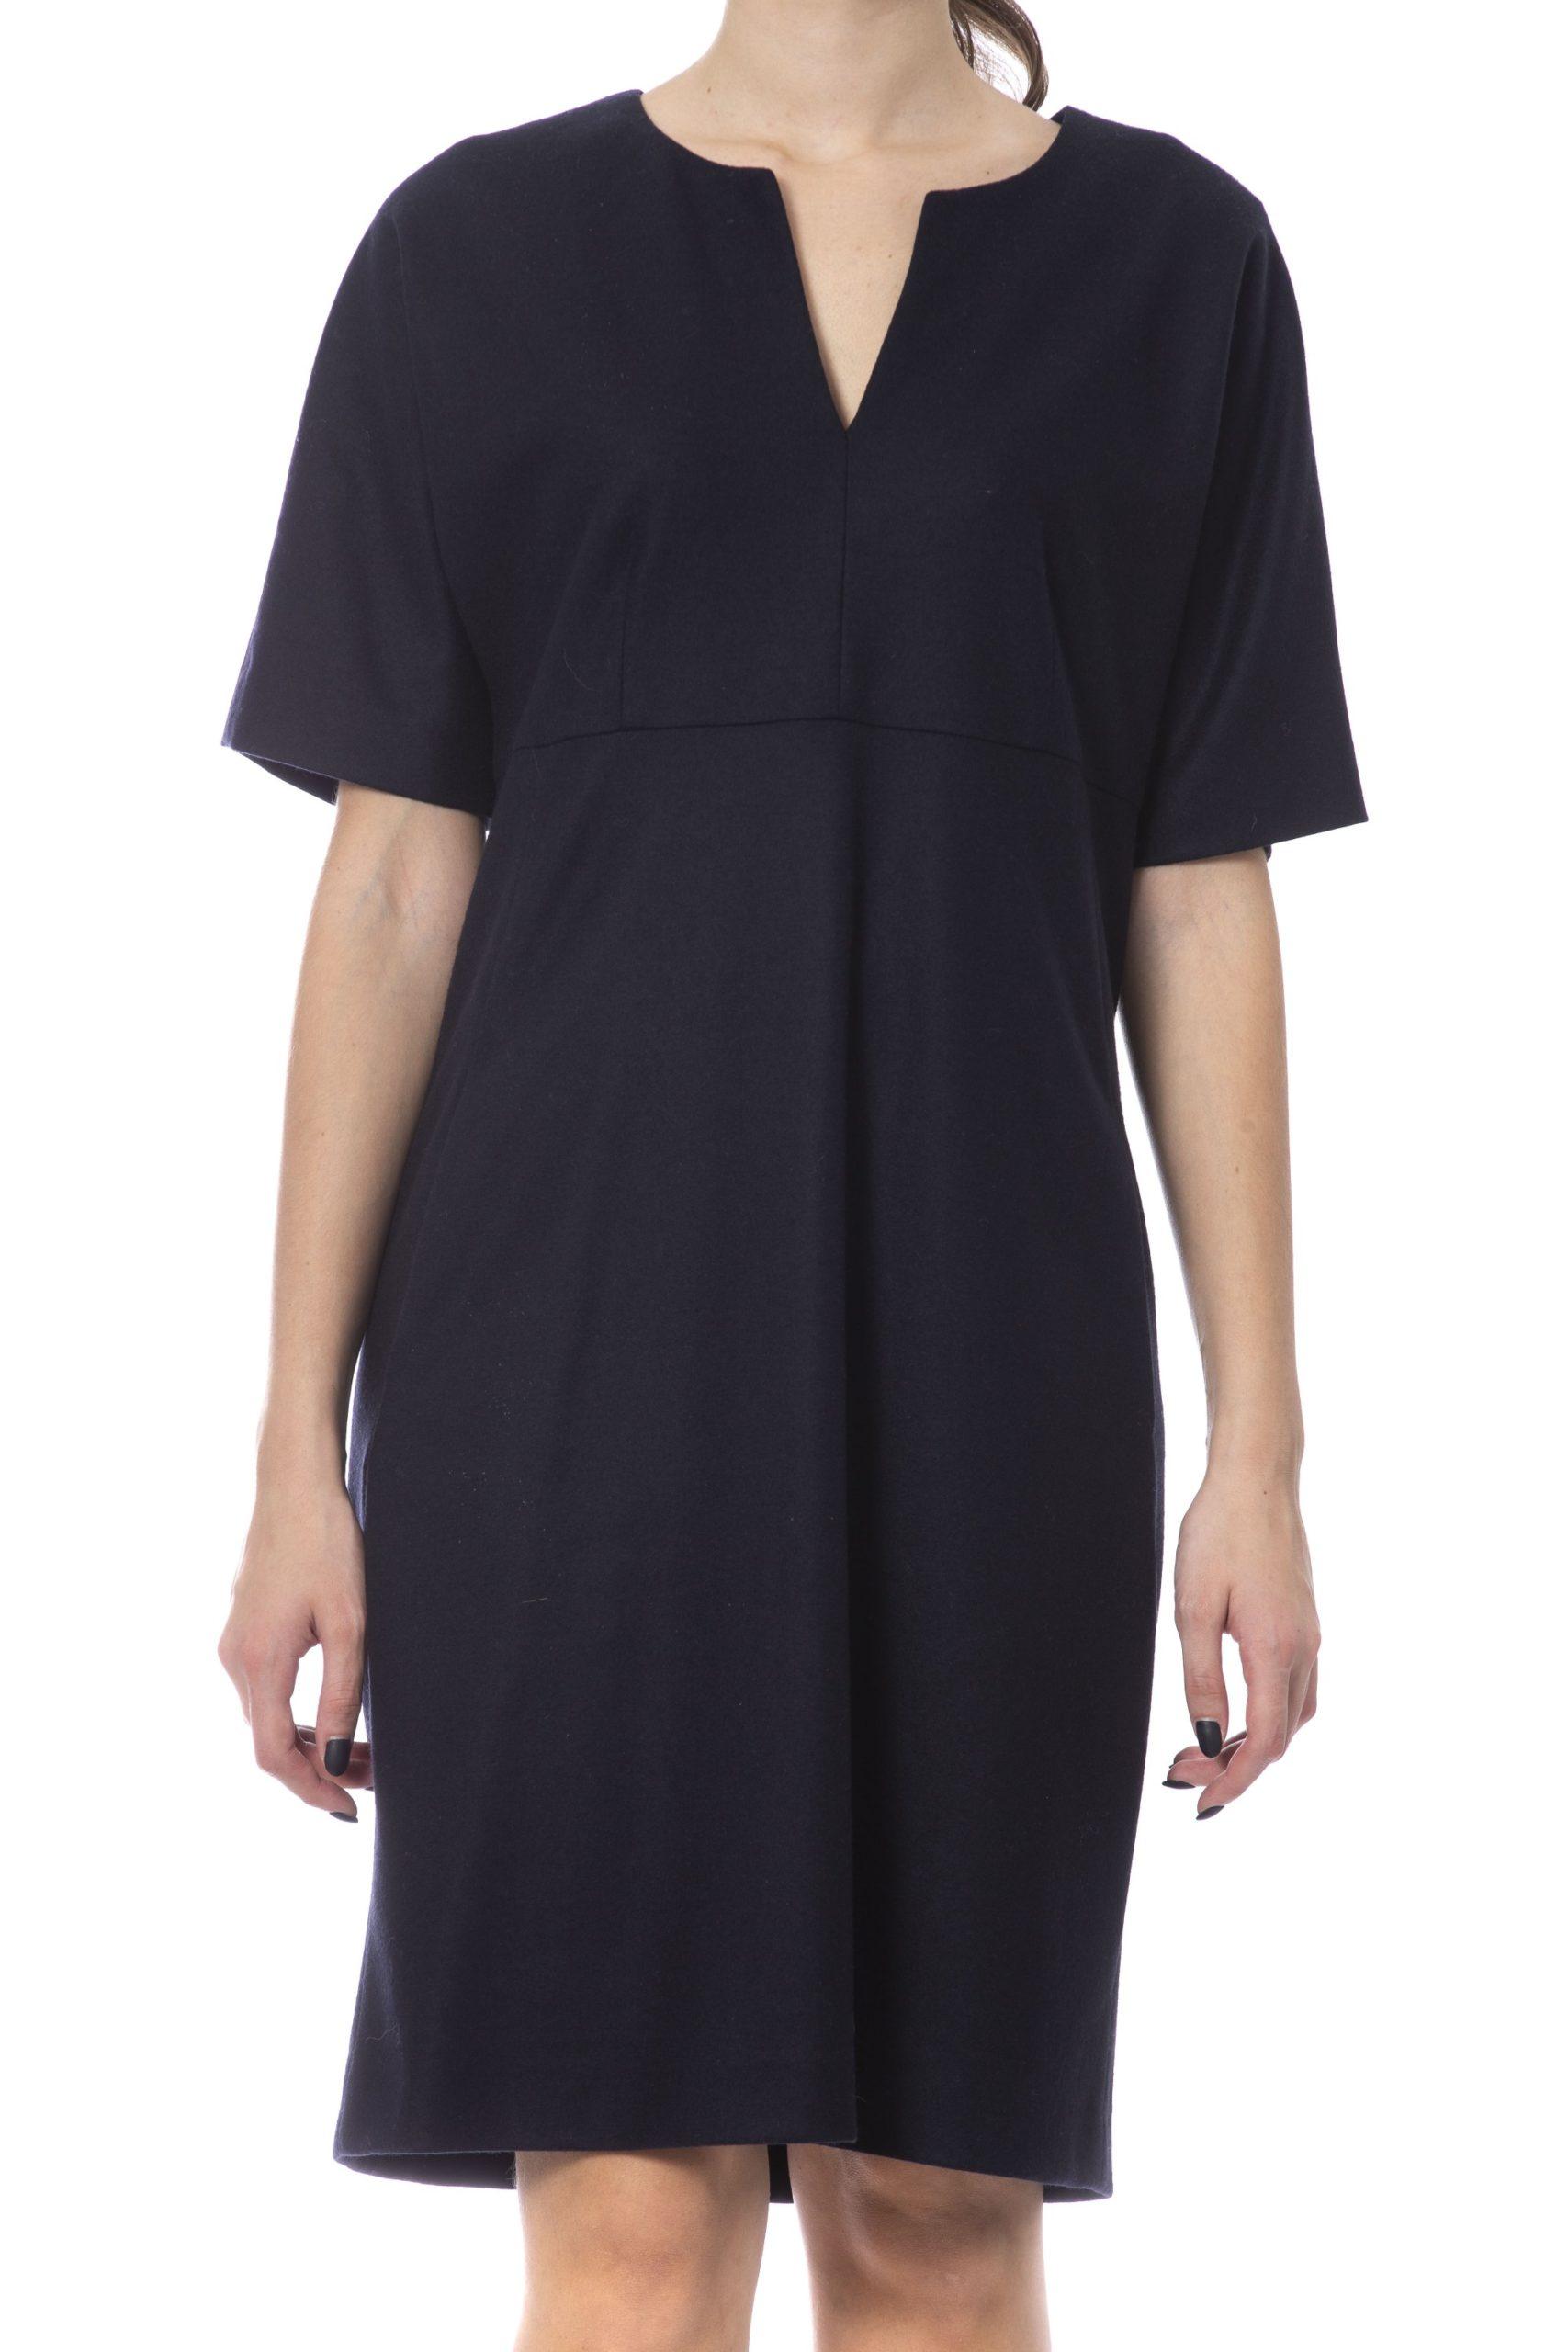 Peserico Women's Dress Blue PE993710 - IT42 | S